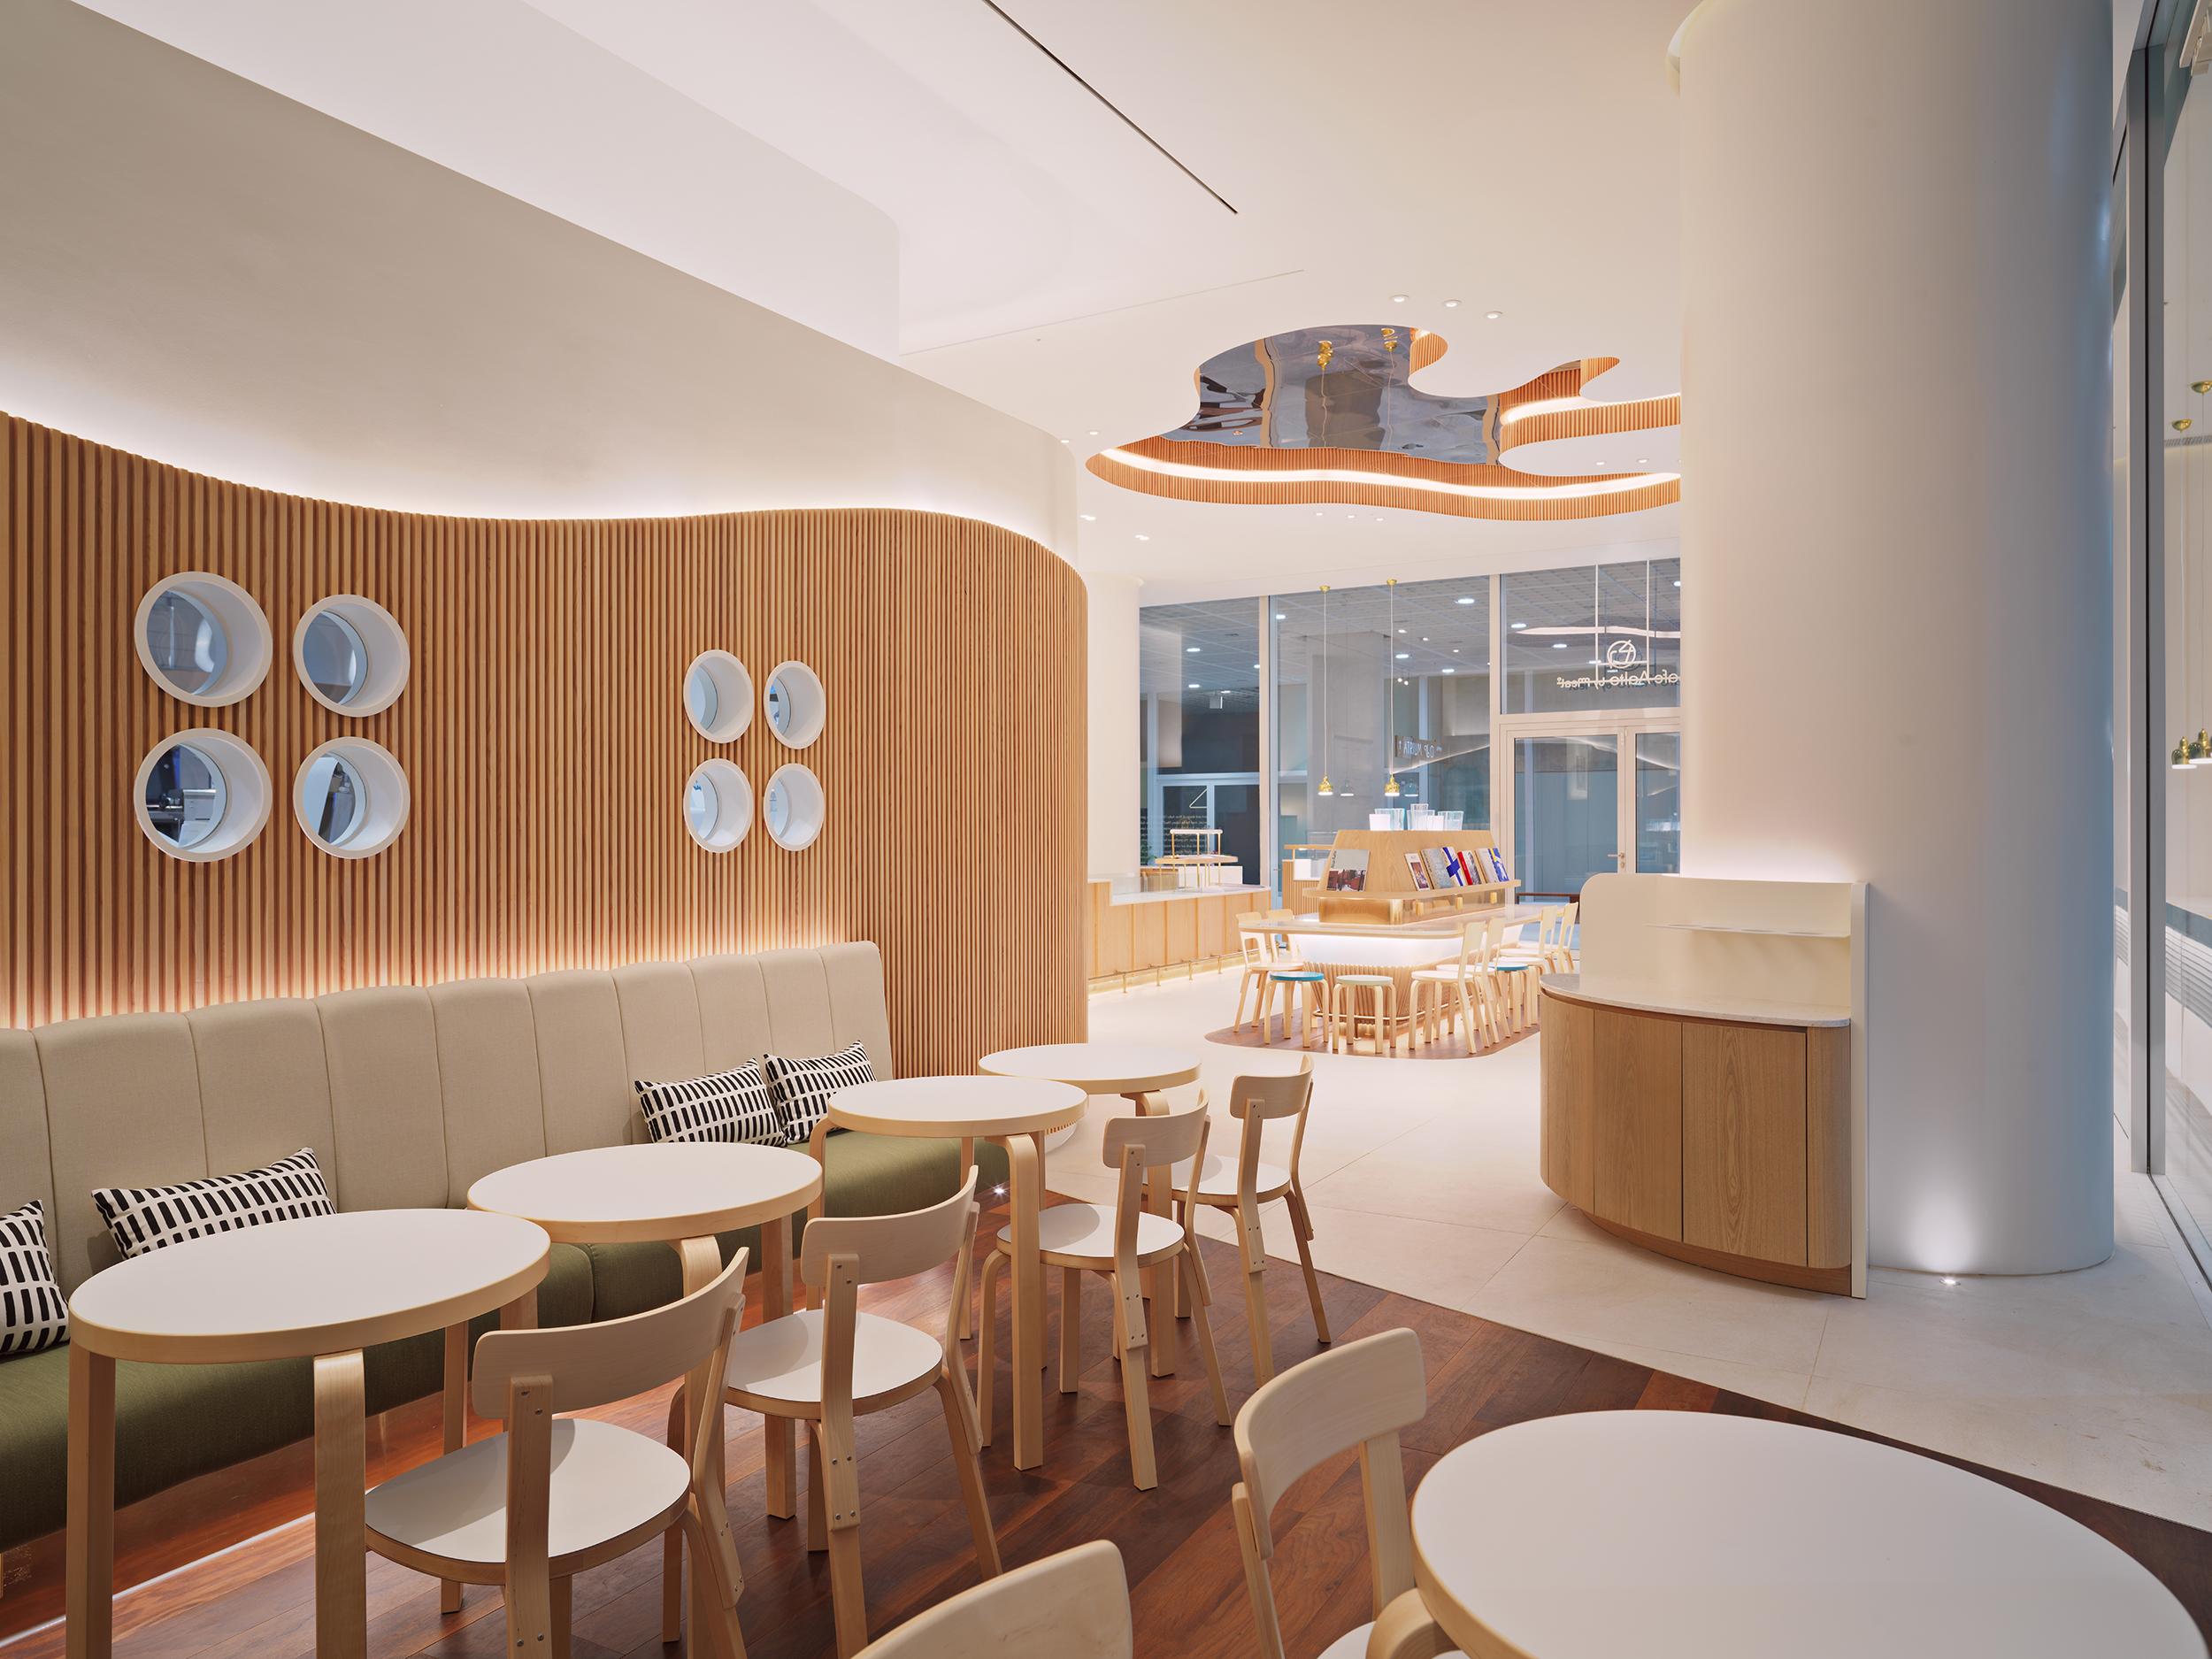 (Teo Yang Studio)Cafe Aalto by Mealdo_14_H resolution.jpg